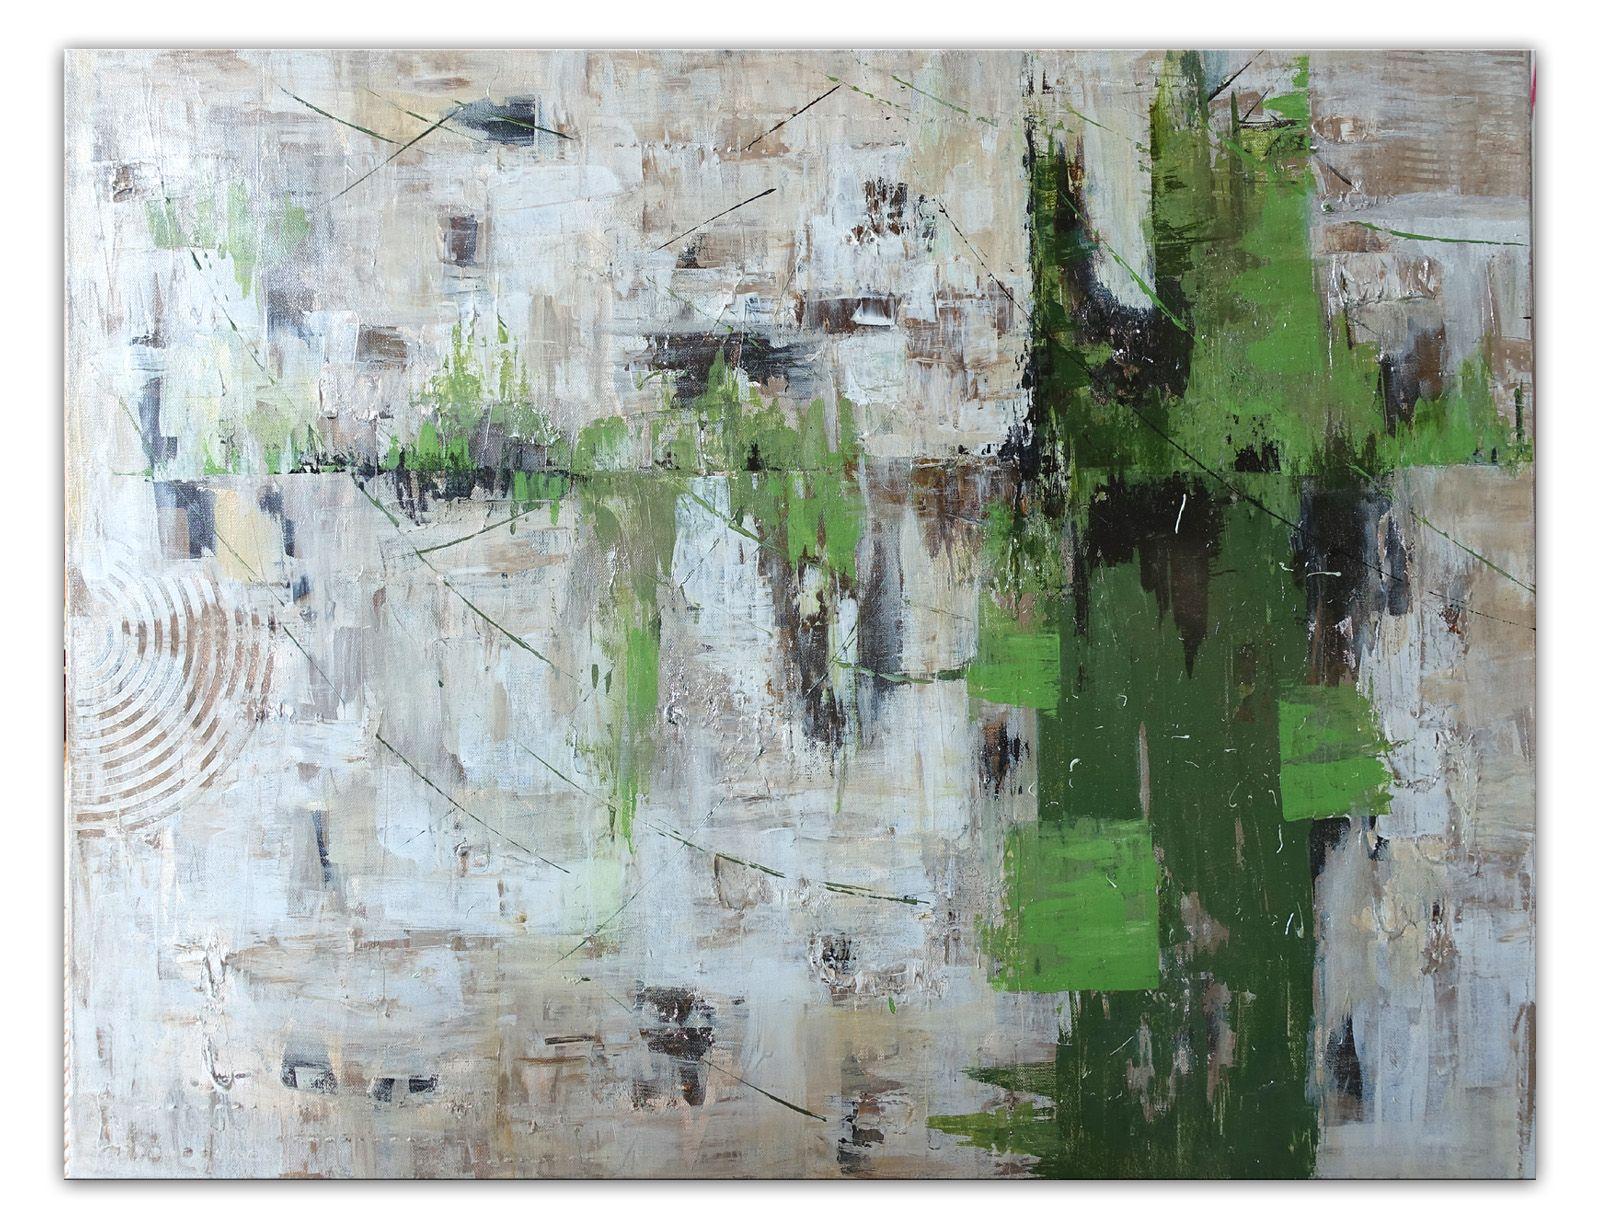 252 verkaufte abstrakte malerei grun grau querformat wandbilder original gemalde kunst kunstwerke unika abstrakt acryl acrylbilder rot